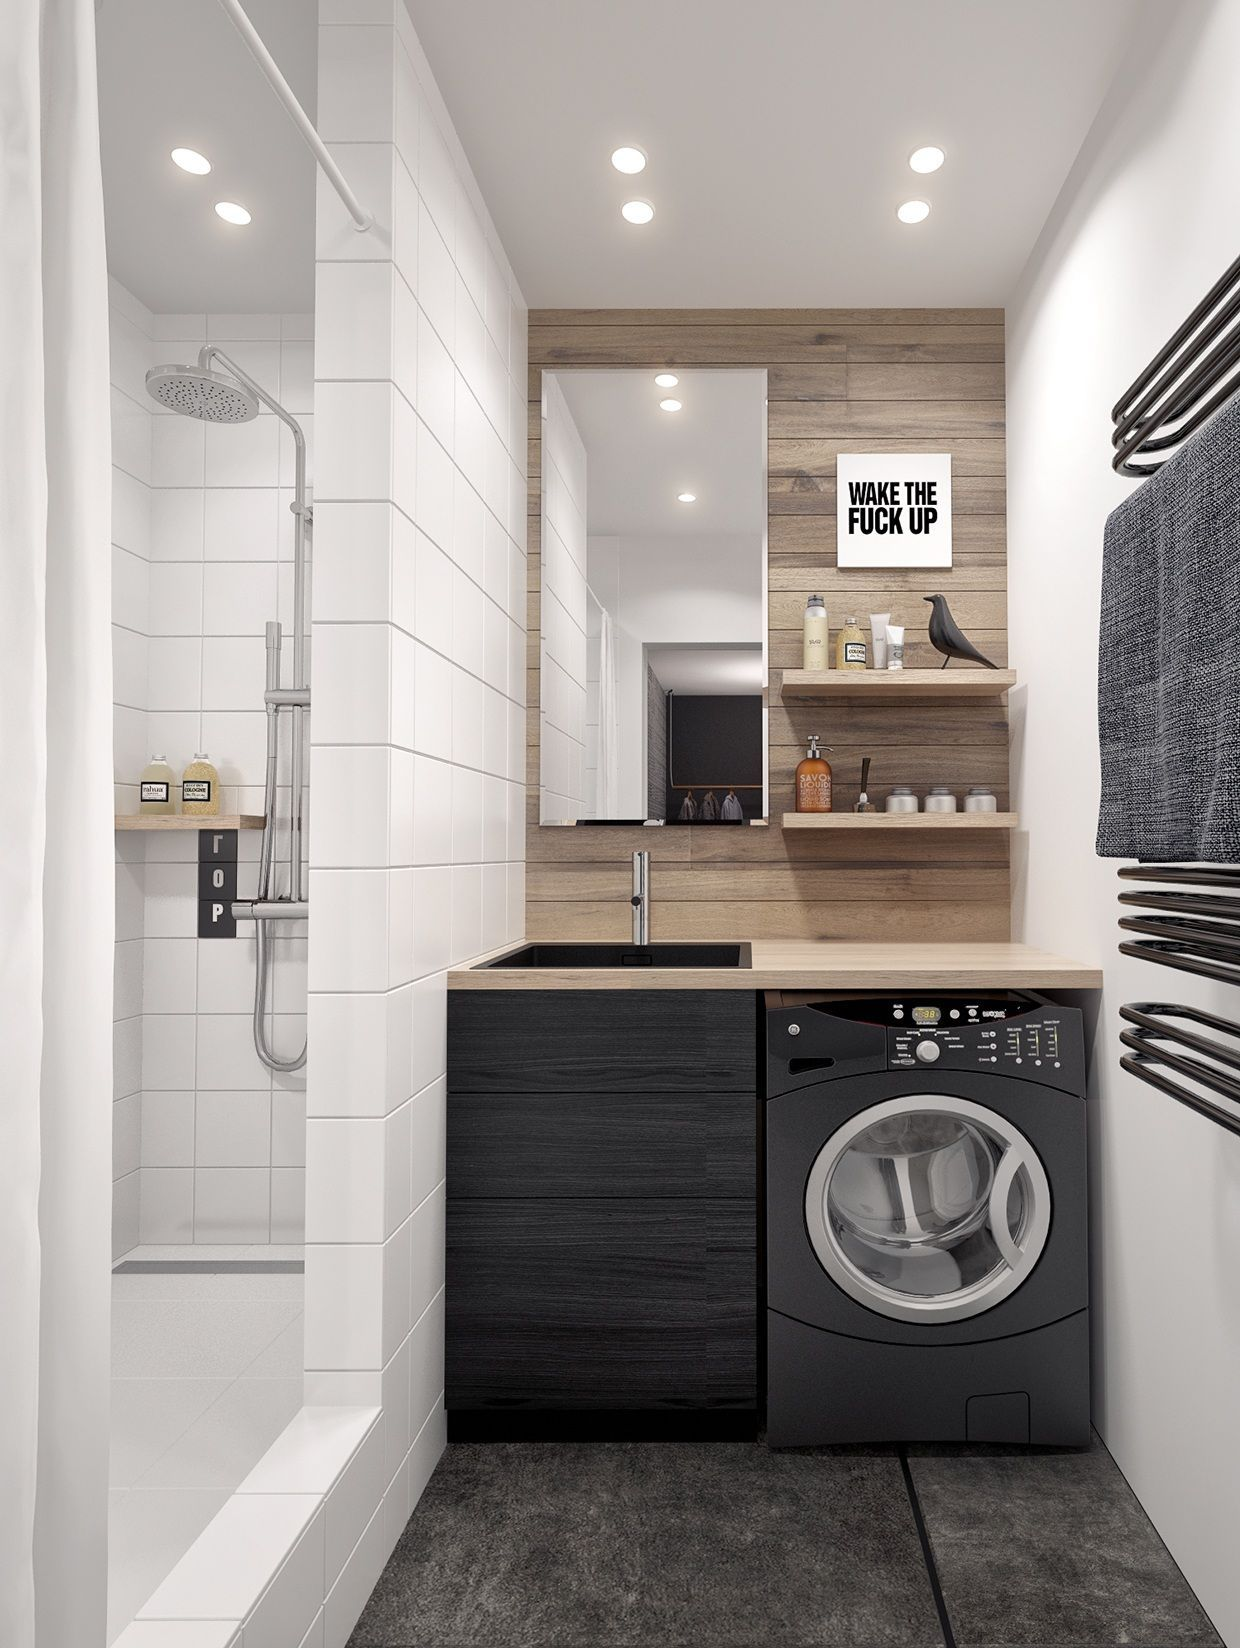 10 Bathroom Heating Ideas 2020 Dry And